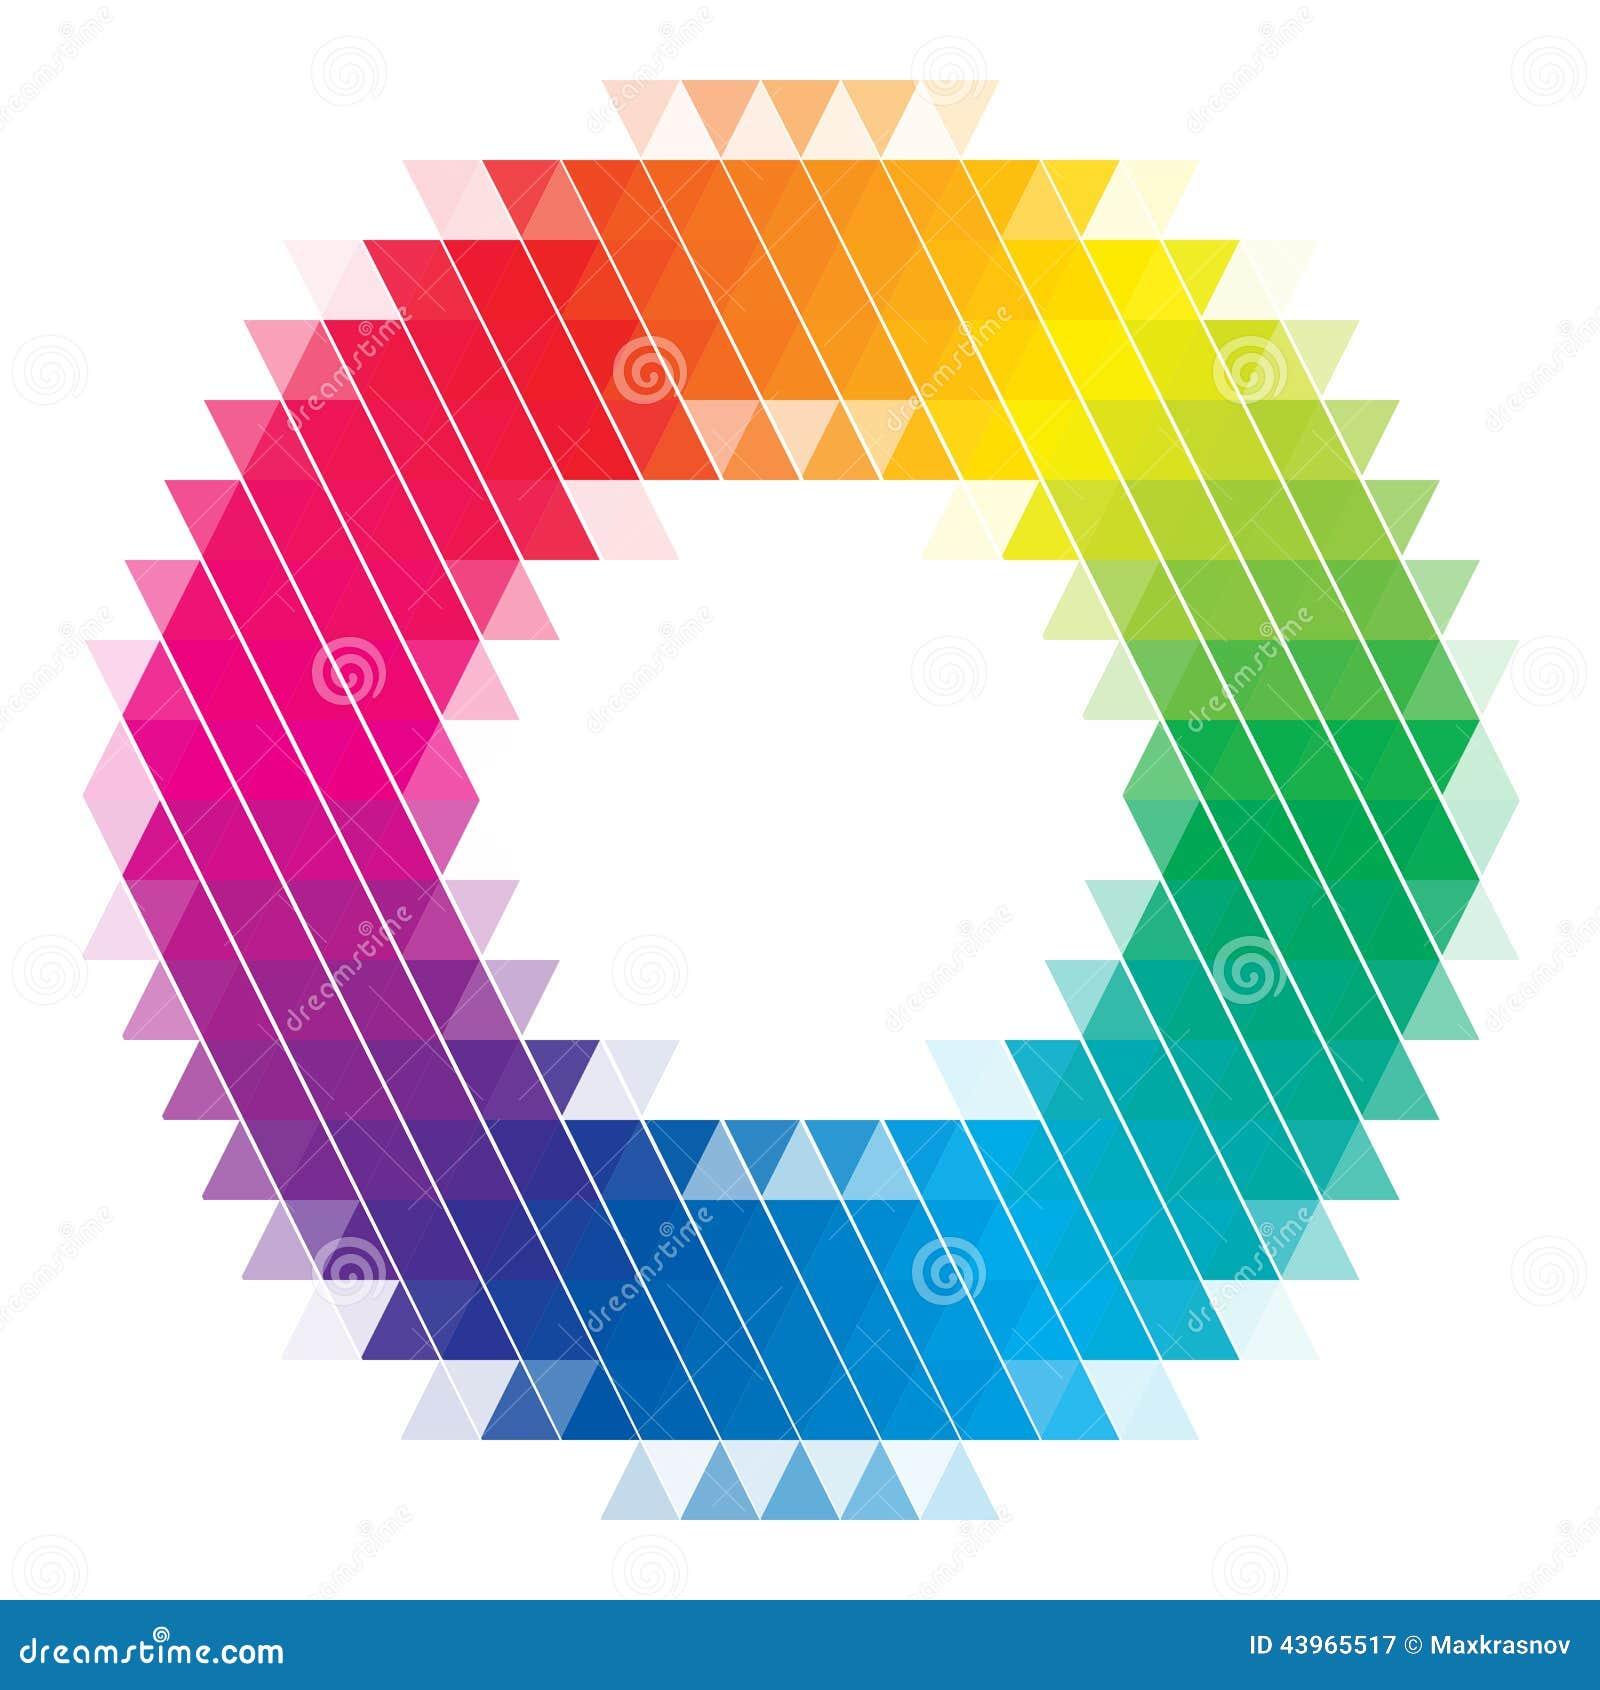 Color Wheel Stock Vector Illustration Of Palette Effect 43965517